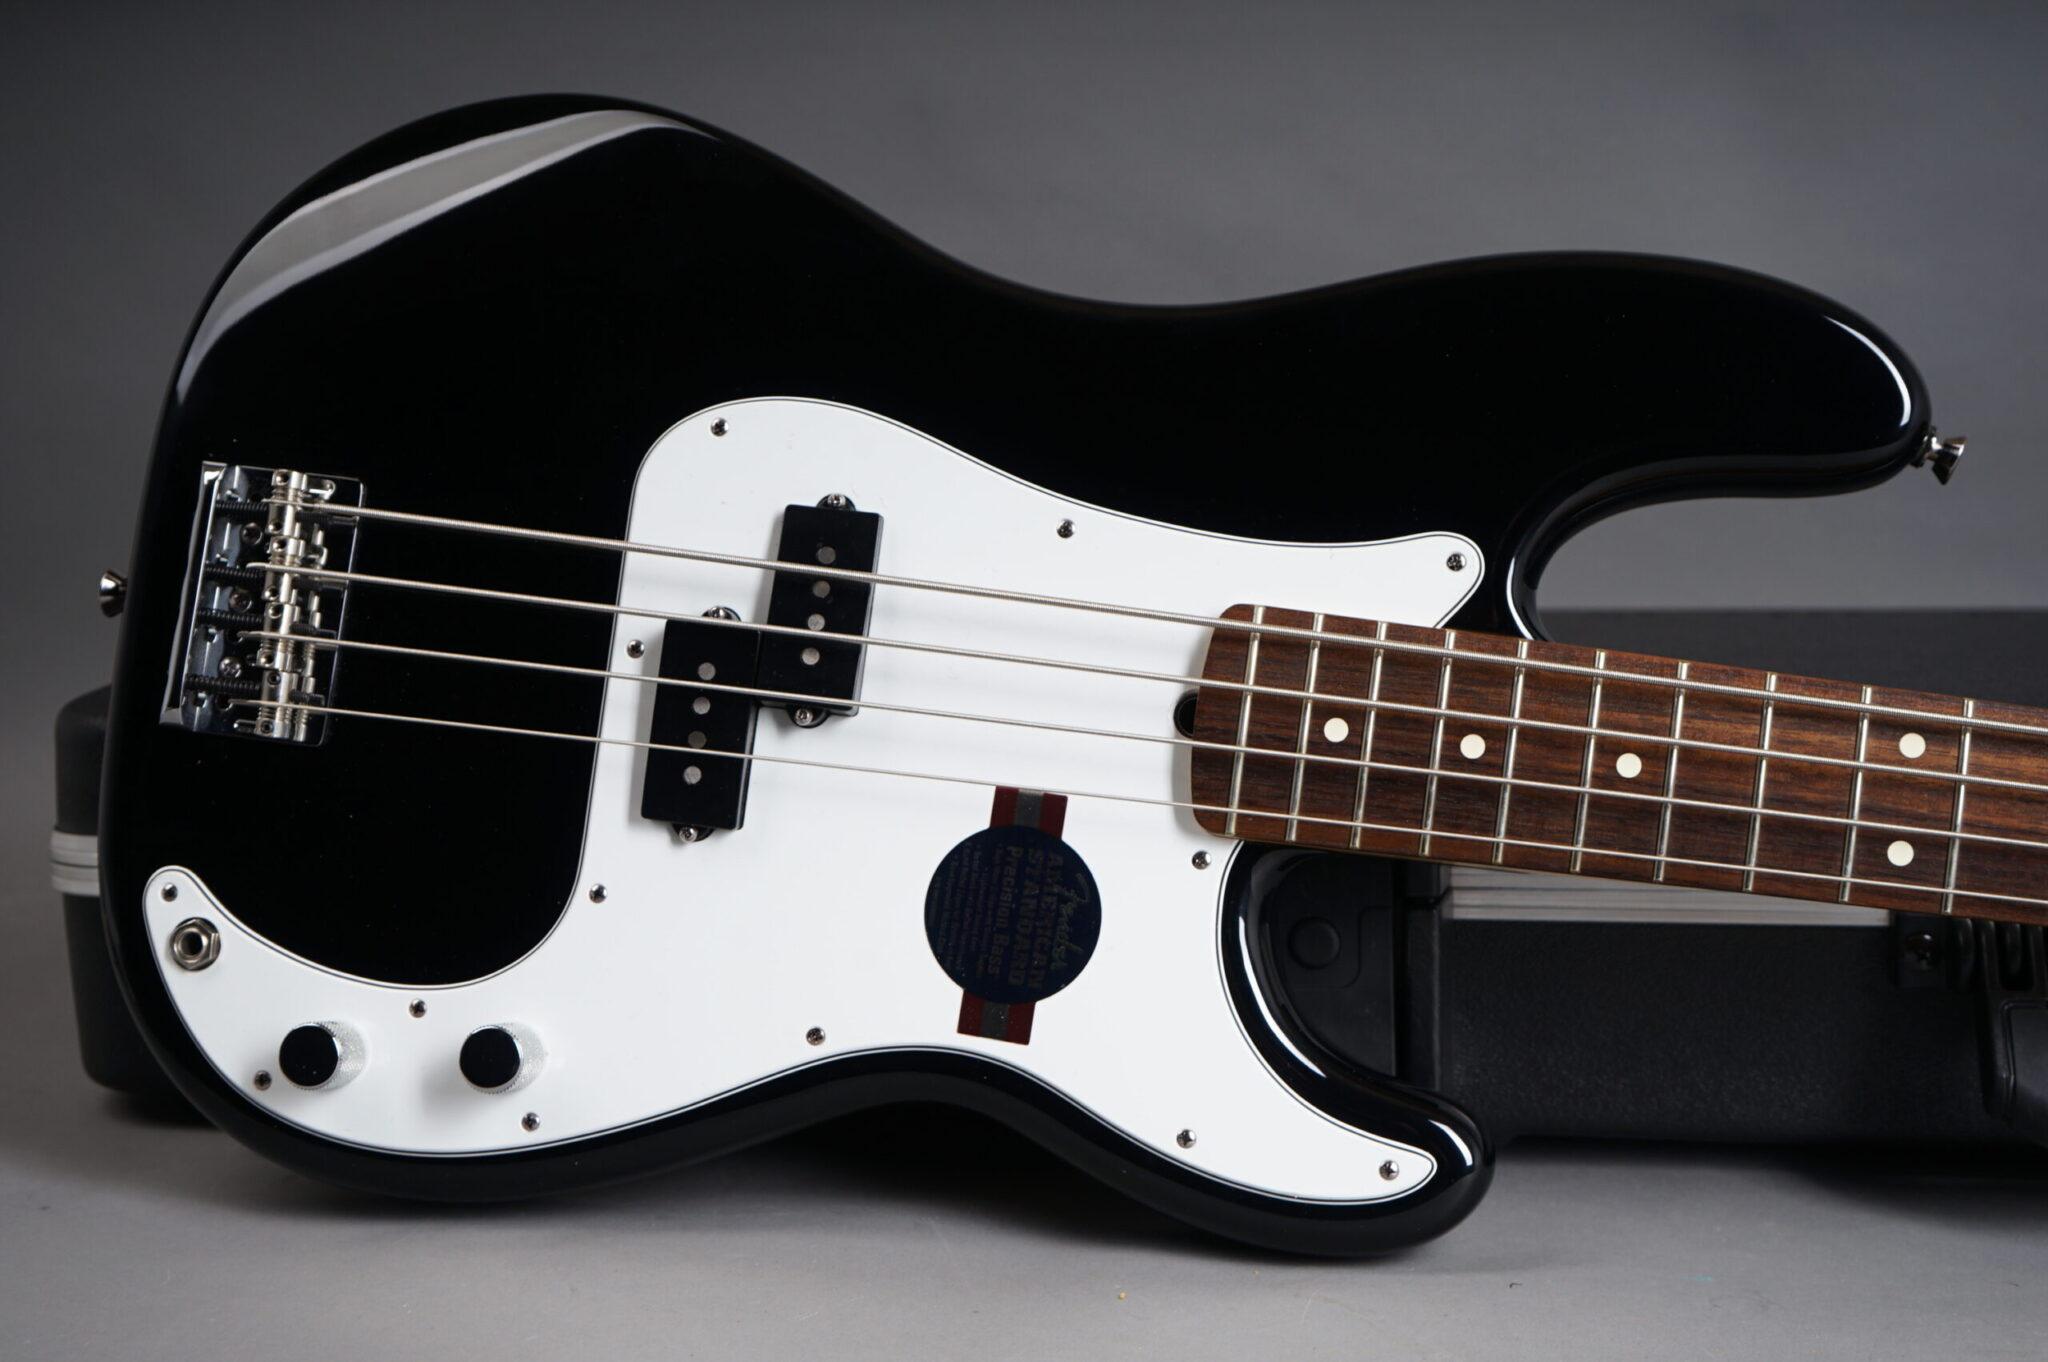 https://guitarpoint.de/app/uploads/products/2008-fender-american-standard-precision-bass-black/2008-Fender-Precision-Bass-American-Standard-Black-Z8061558-8-scaled-2048x1362.jpg